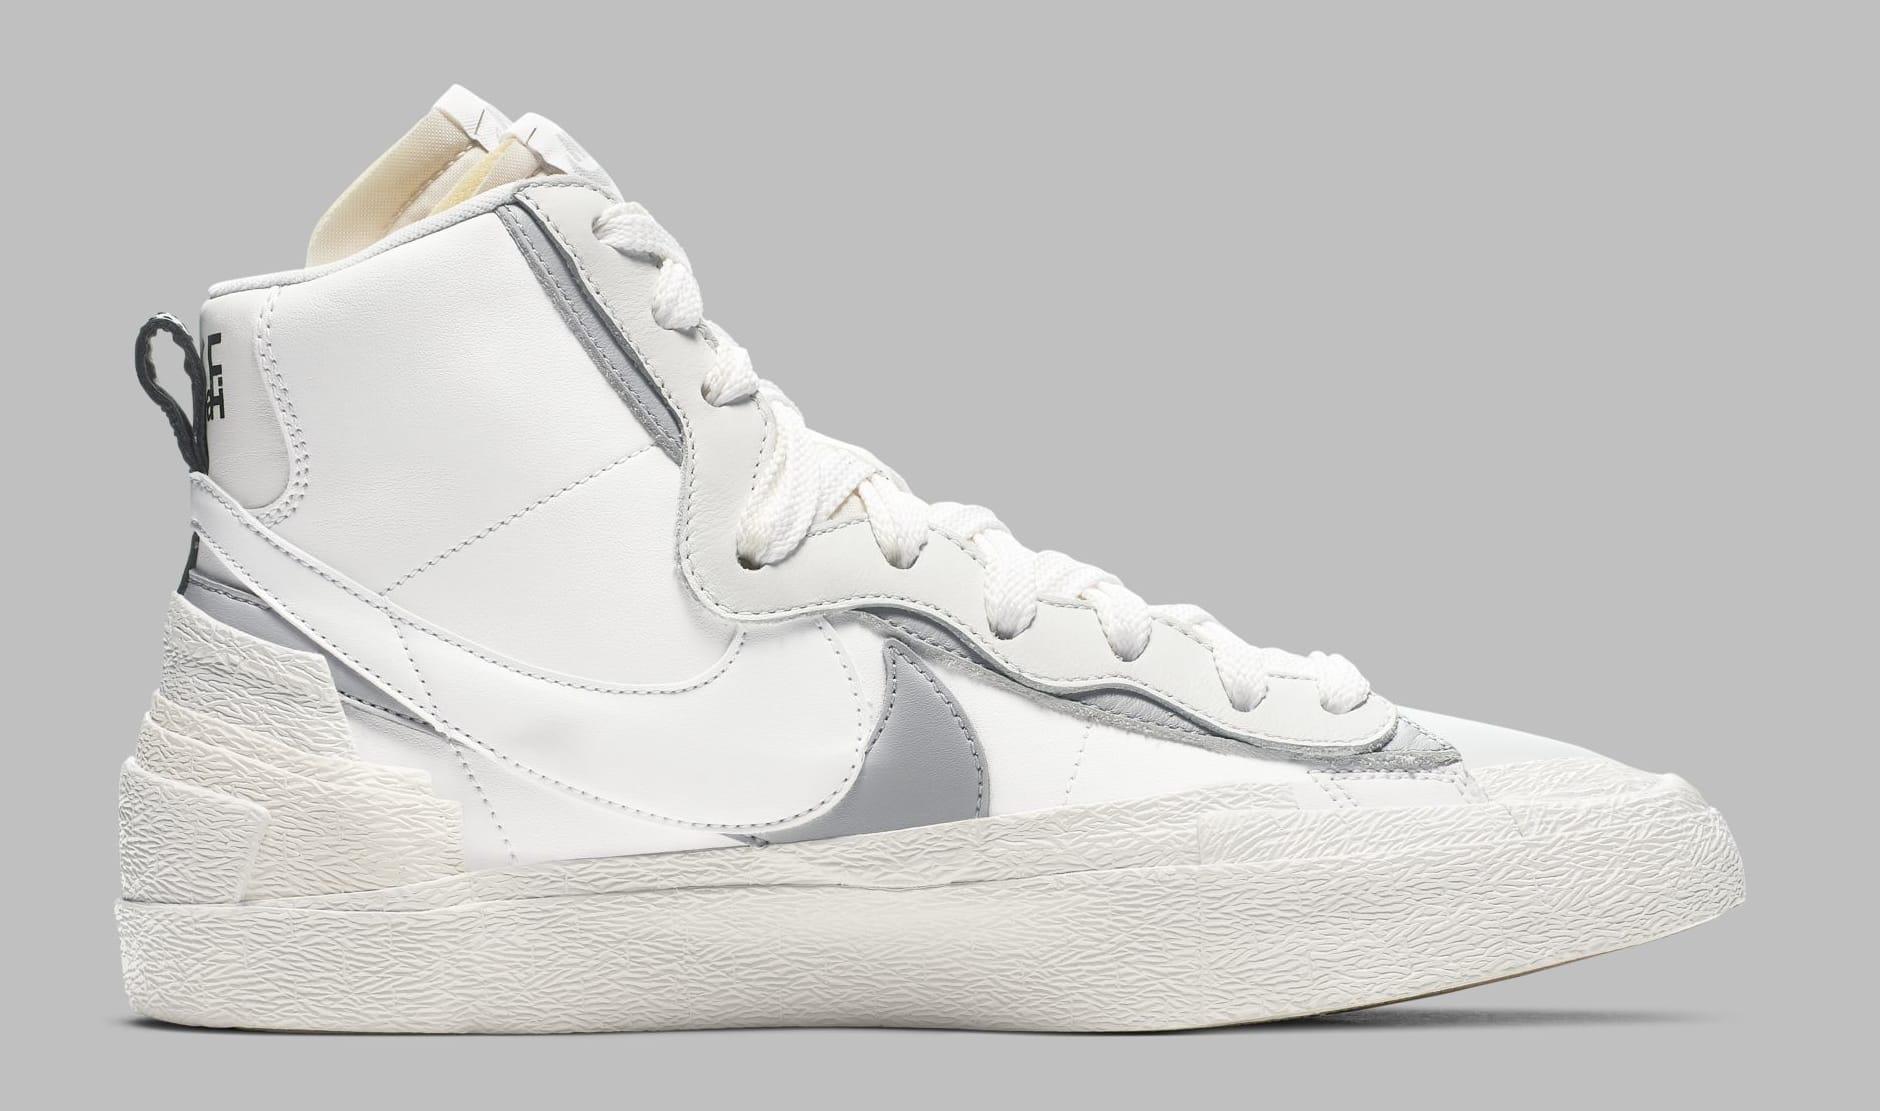 sacai-nike-blazer-mid-white-bv0072-100-medial